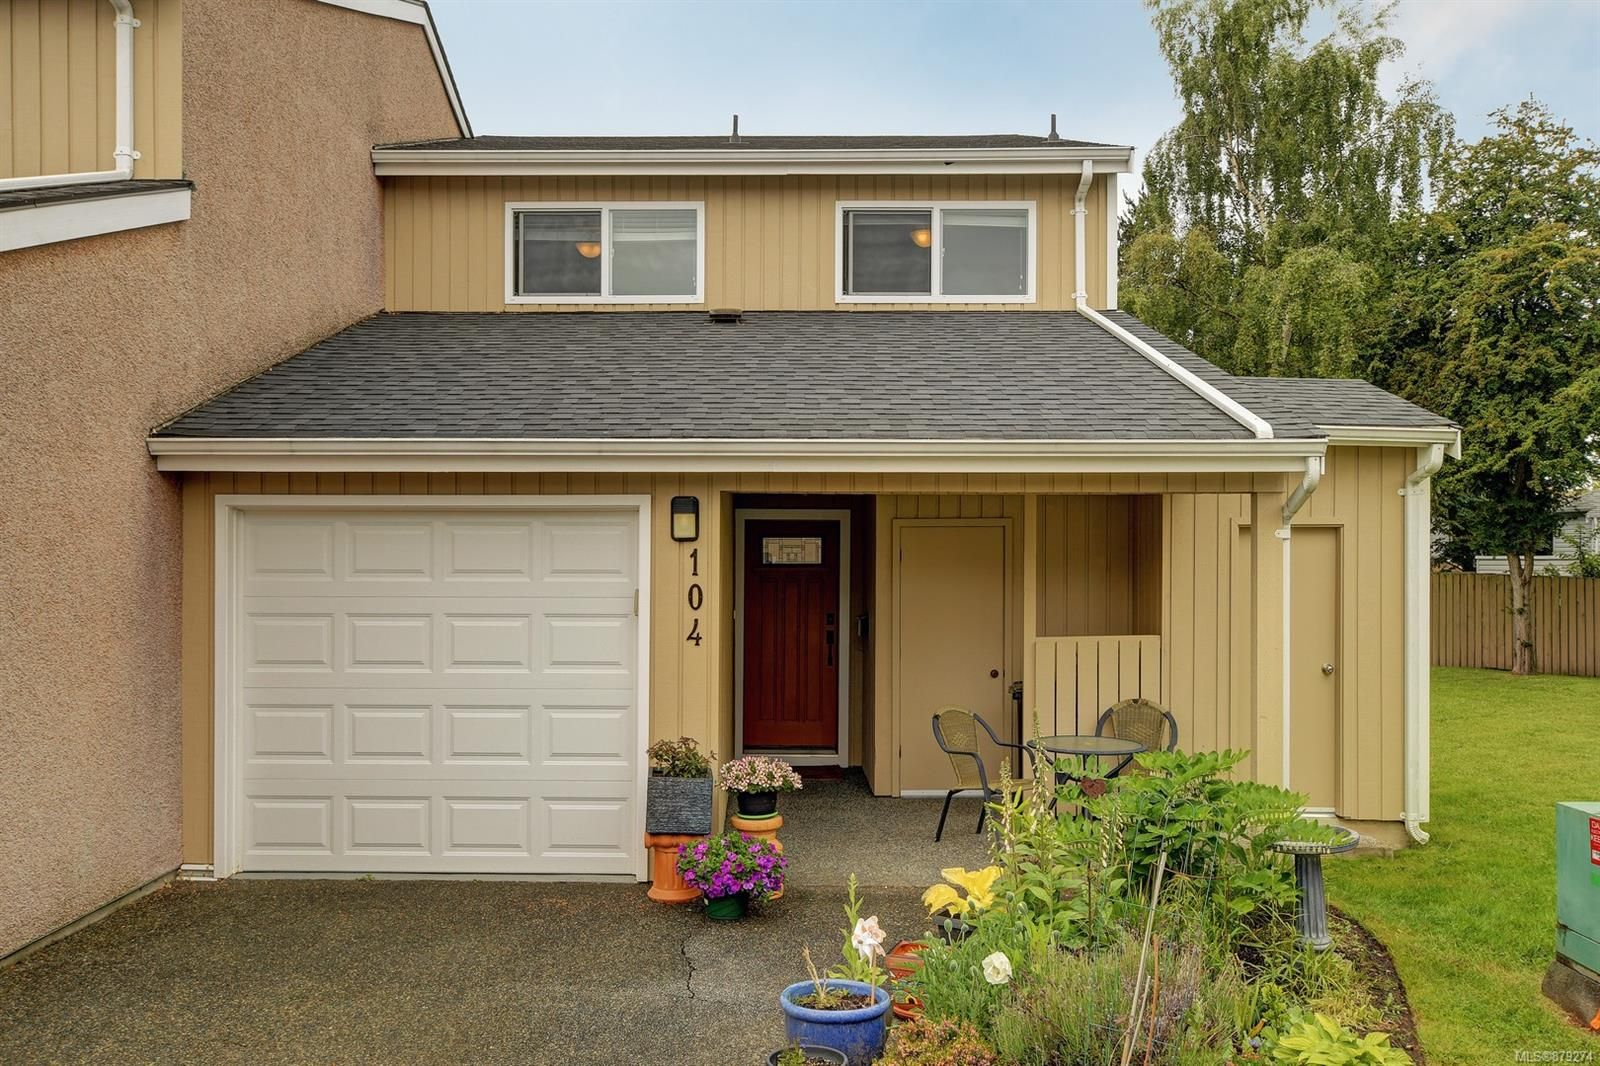 Main Photo: 104 3048 Washington Ave in : Vi Burnside Row/Townhouse for sale (Victoria)  : MLS®# 879274